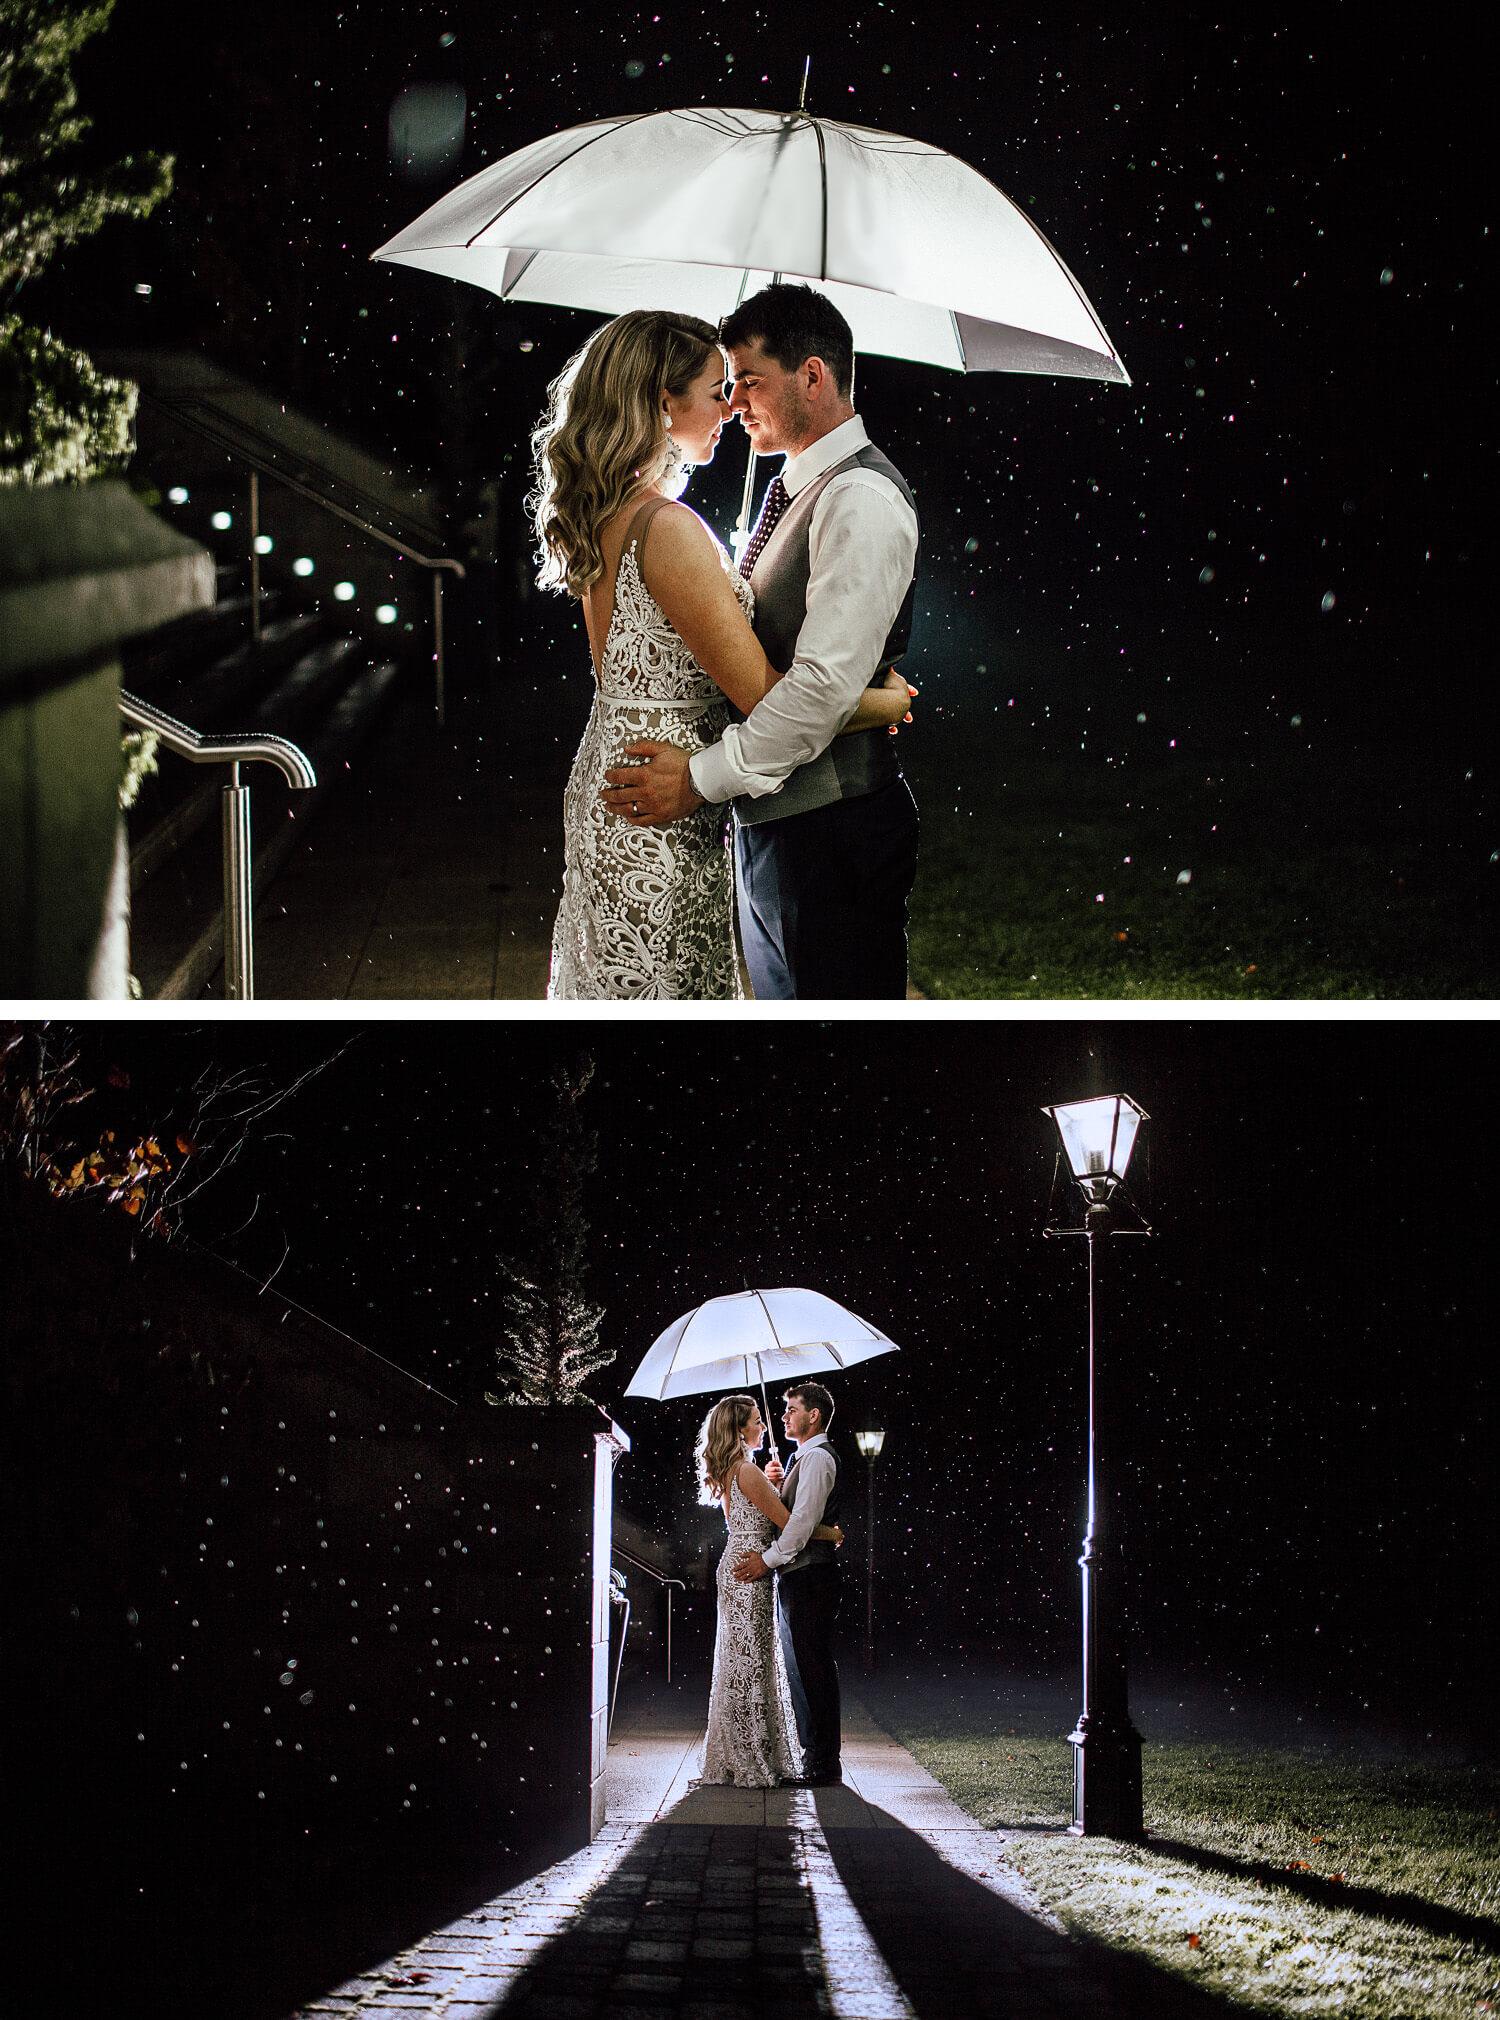 darren-fitzpatrick-photography- killyhevlin-wedding 34